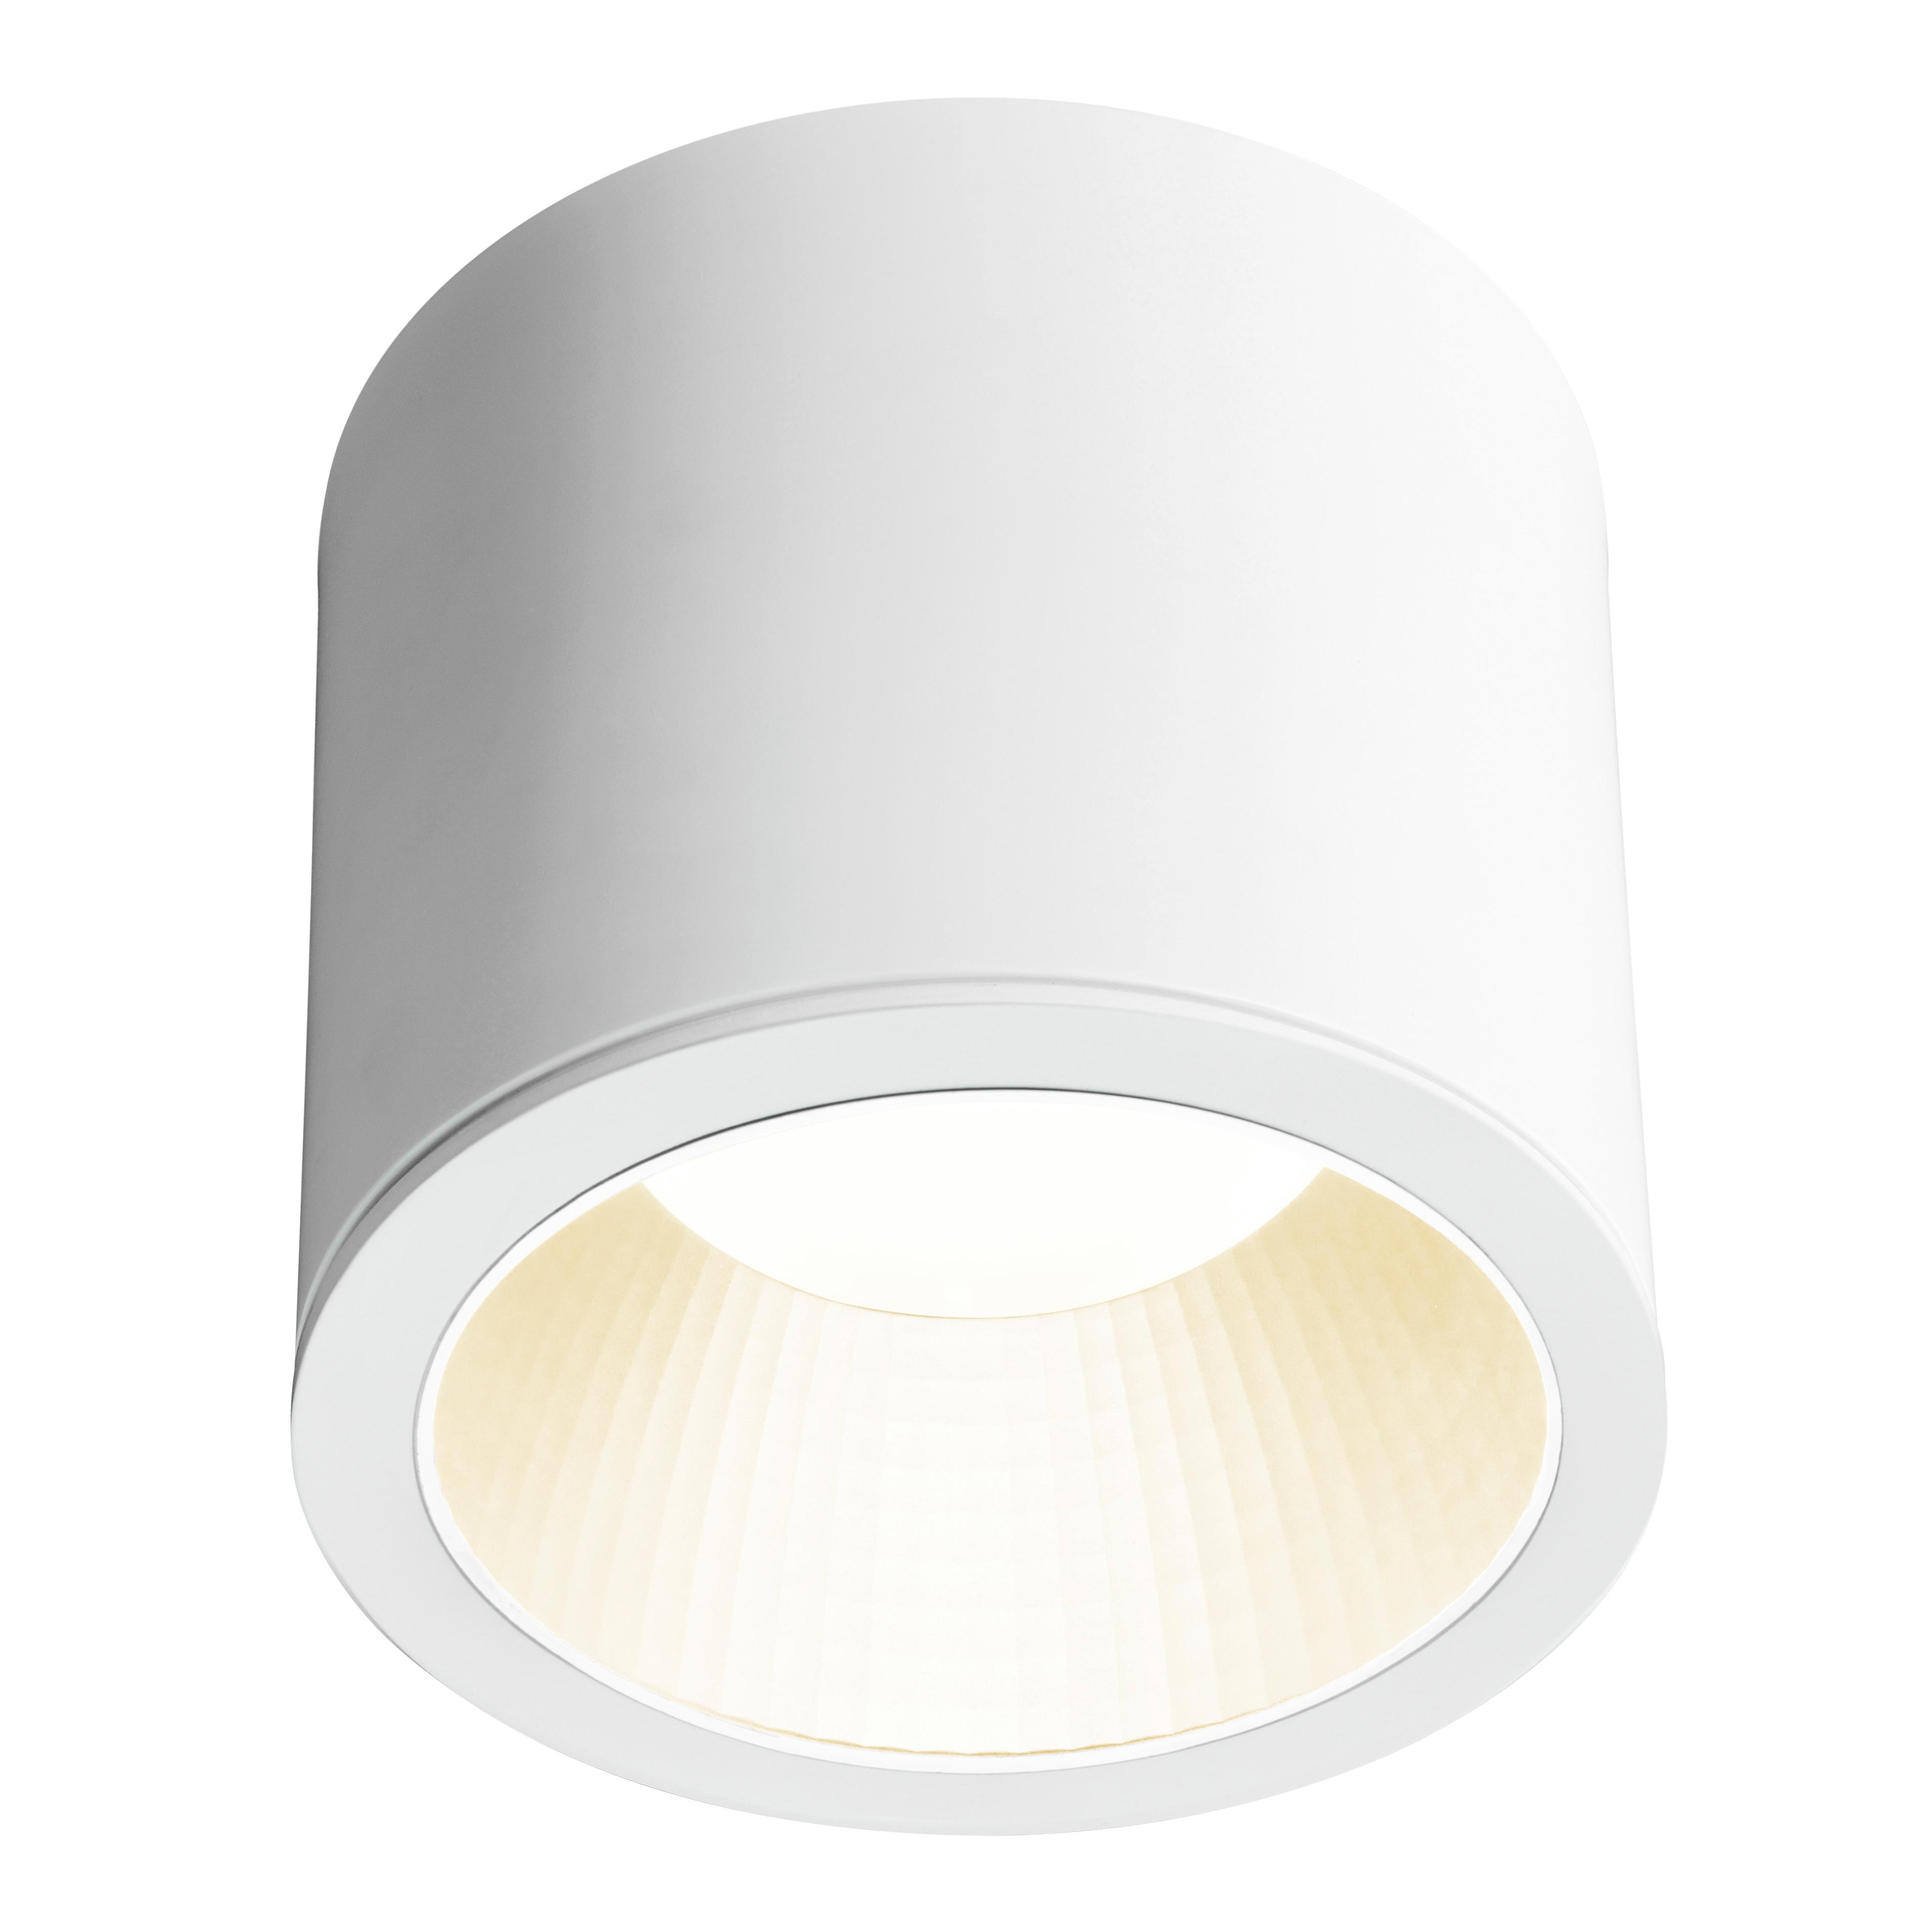 SOLINA 242 LED 24W 2500lm/830 MAT IP20 70° weiß GEN.2